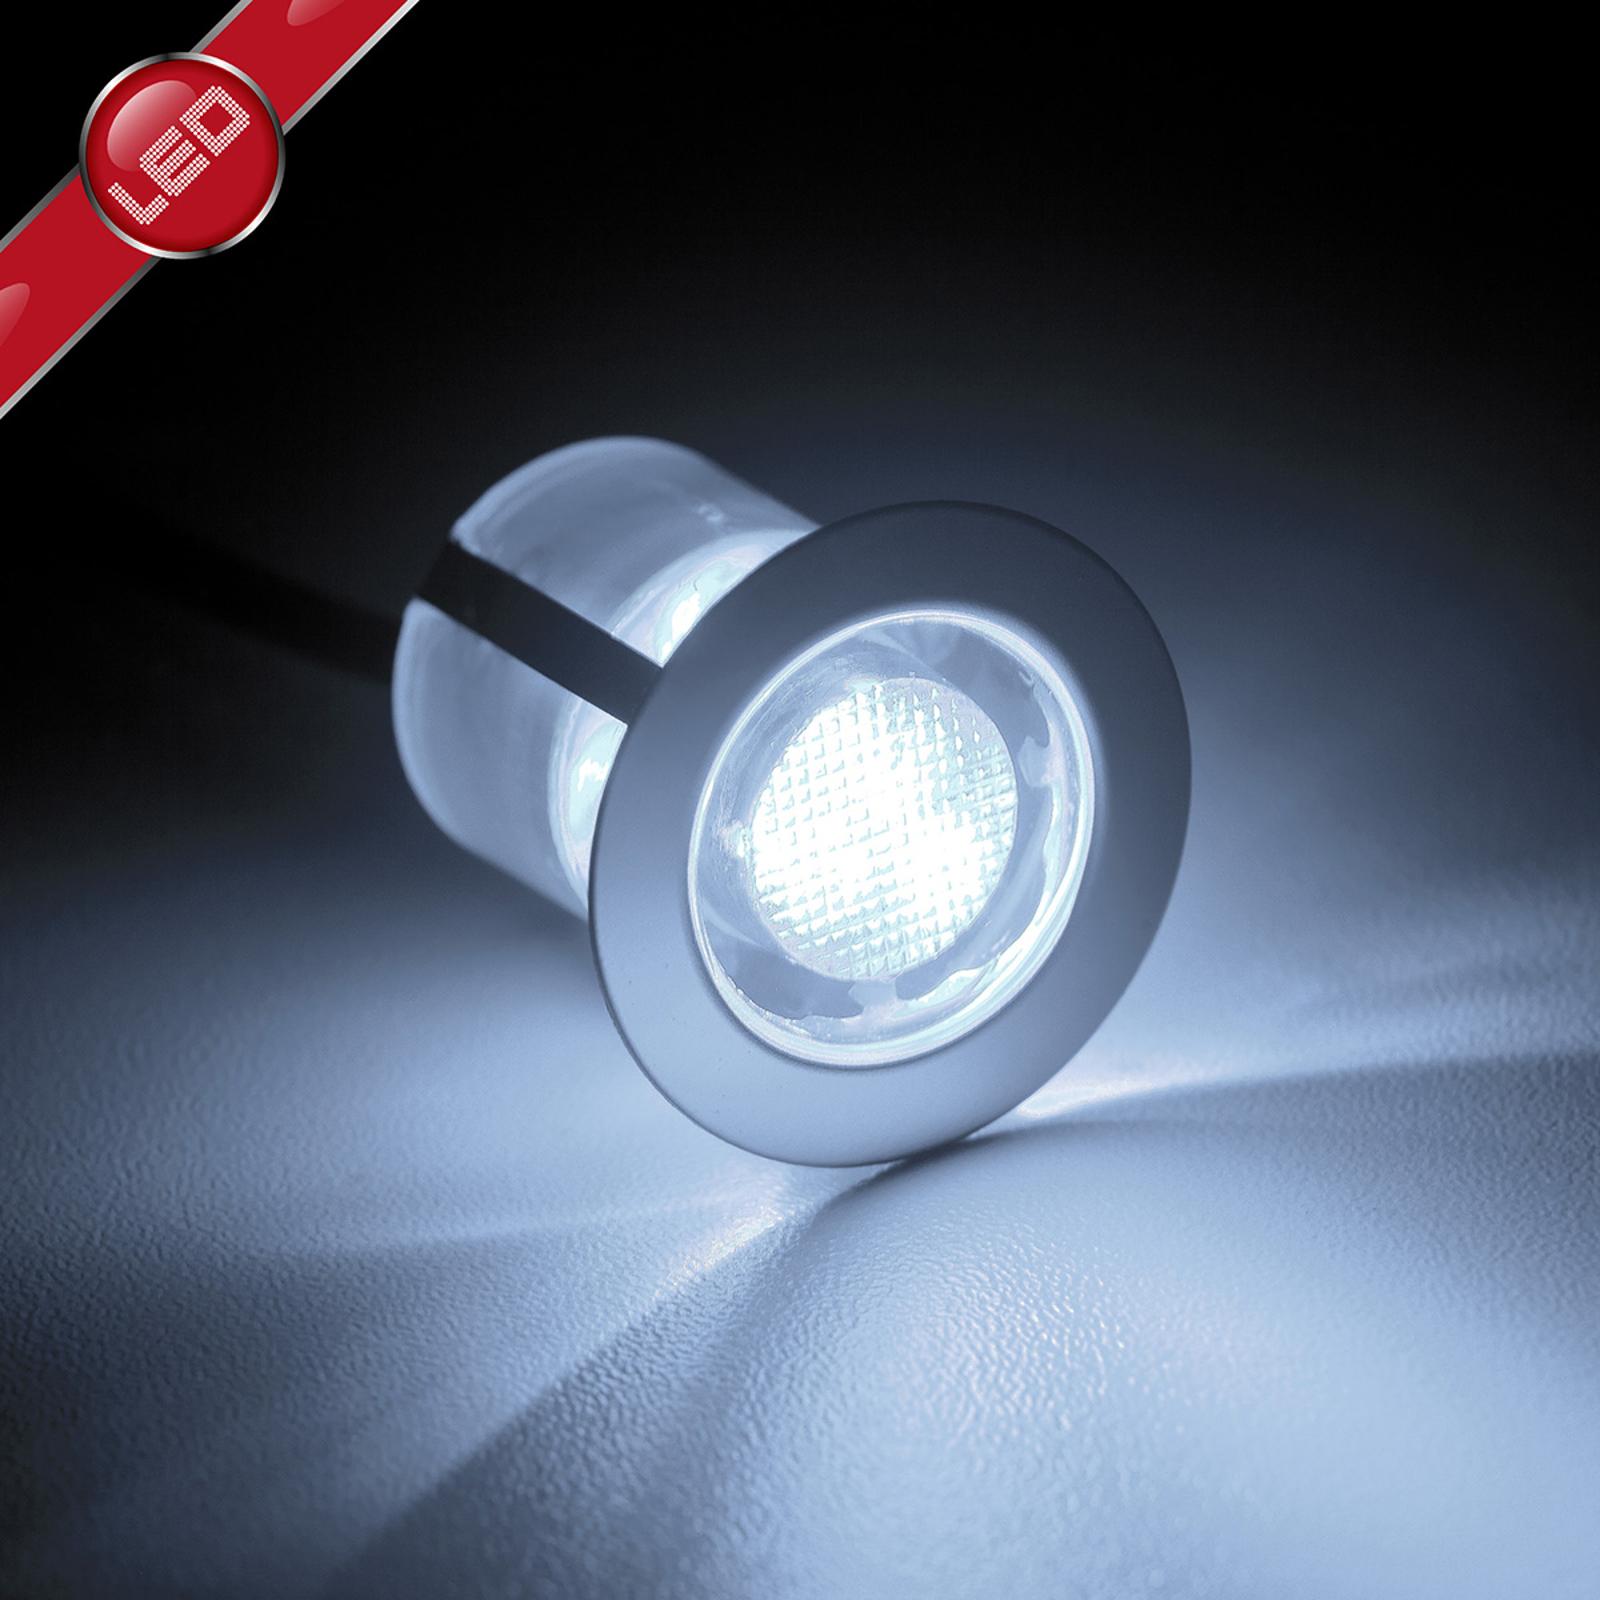 Luminaires LED Cosa, 3cm, 10 pcs, blanc neutre